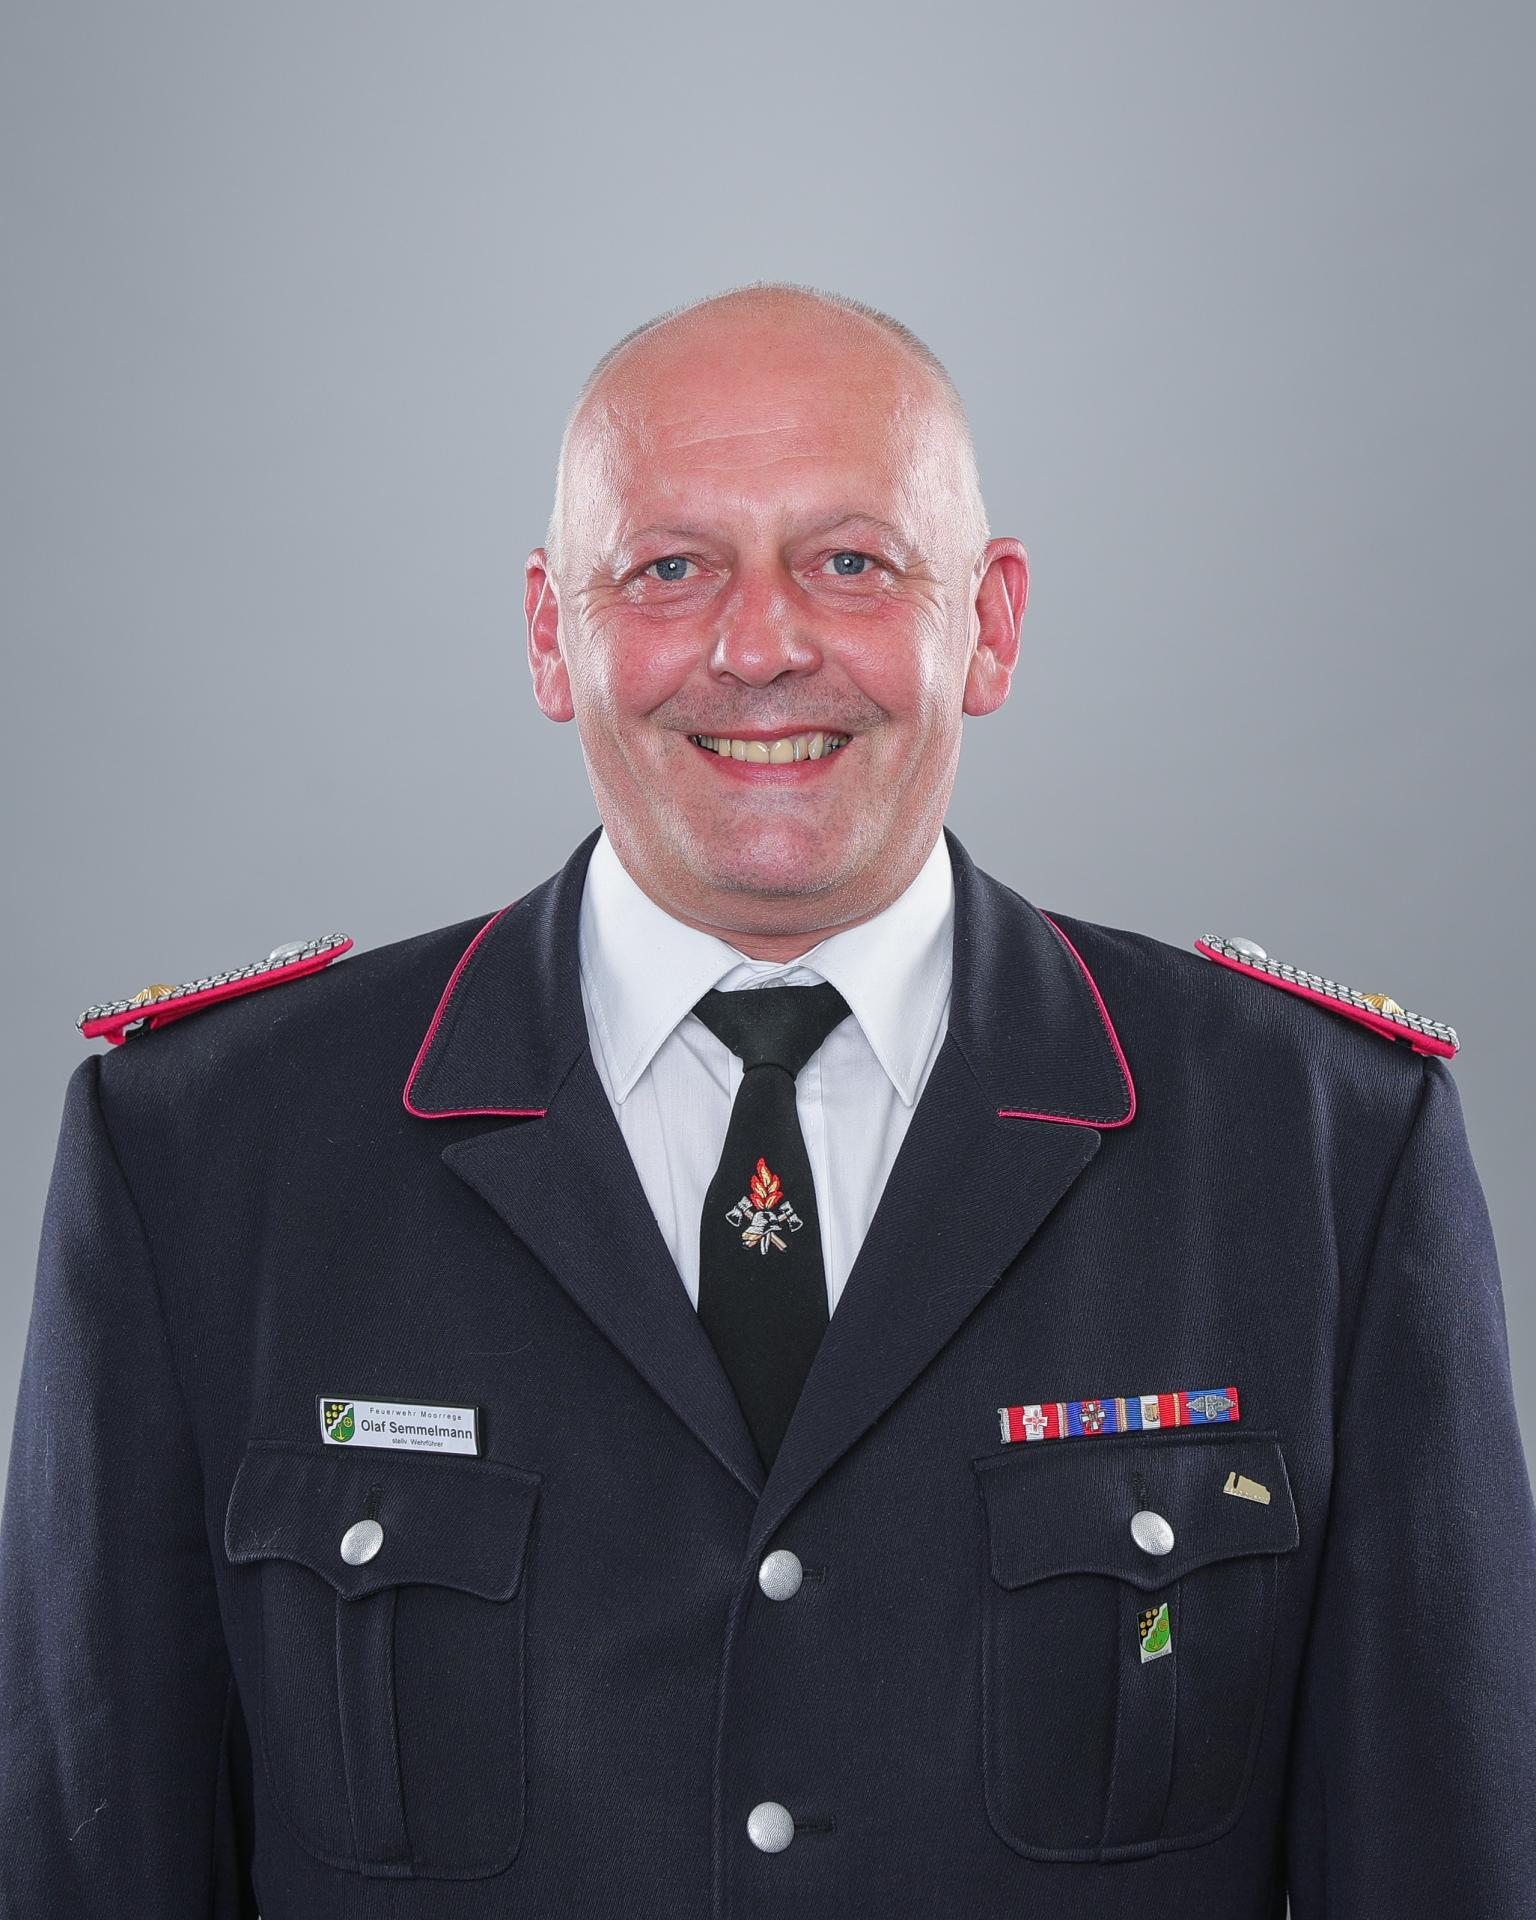 Olaf Semmelmann